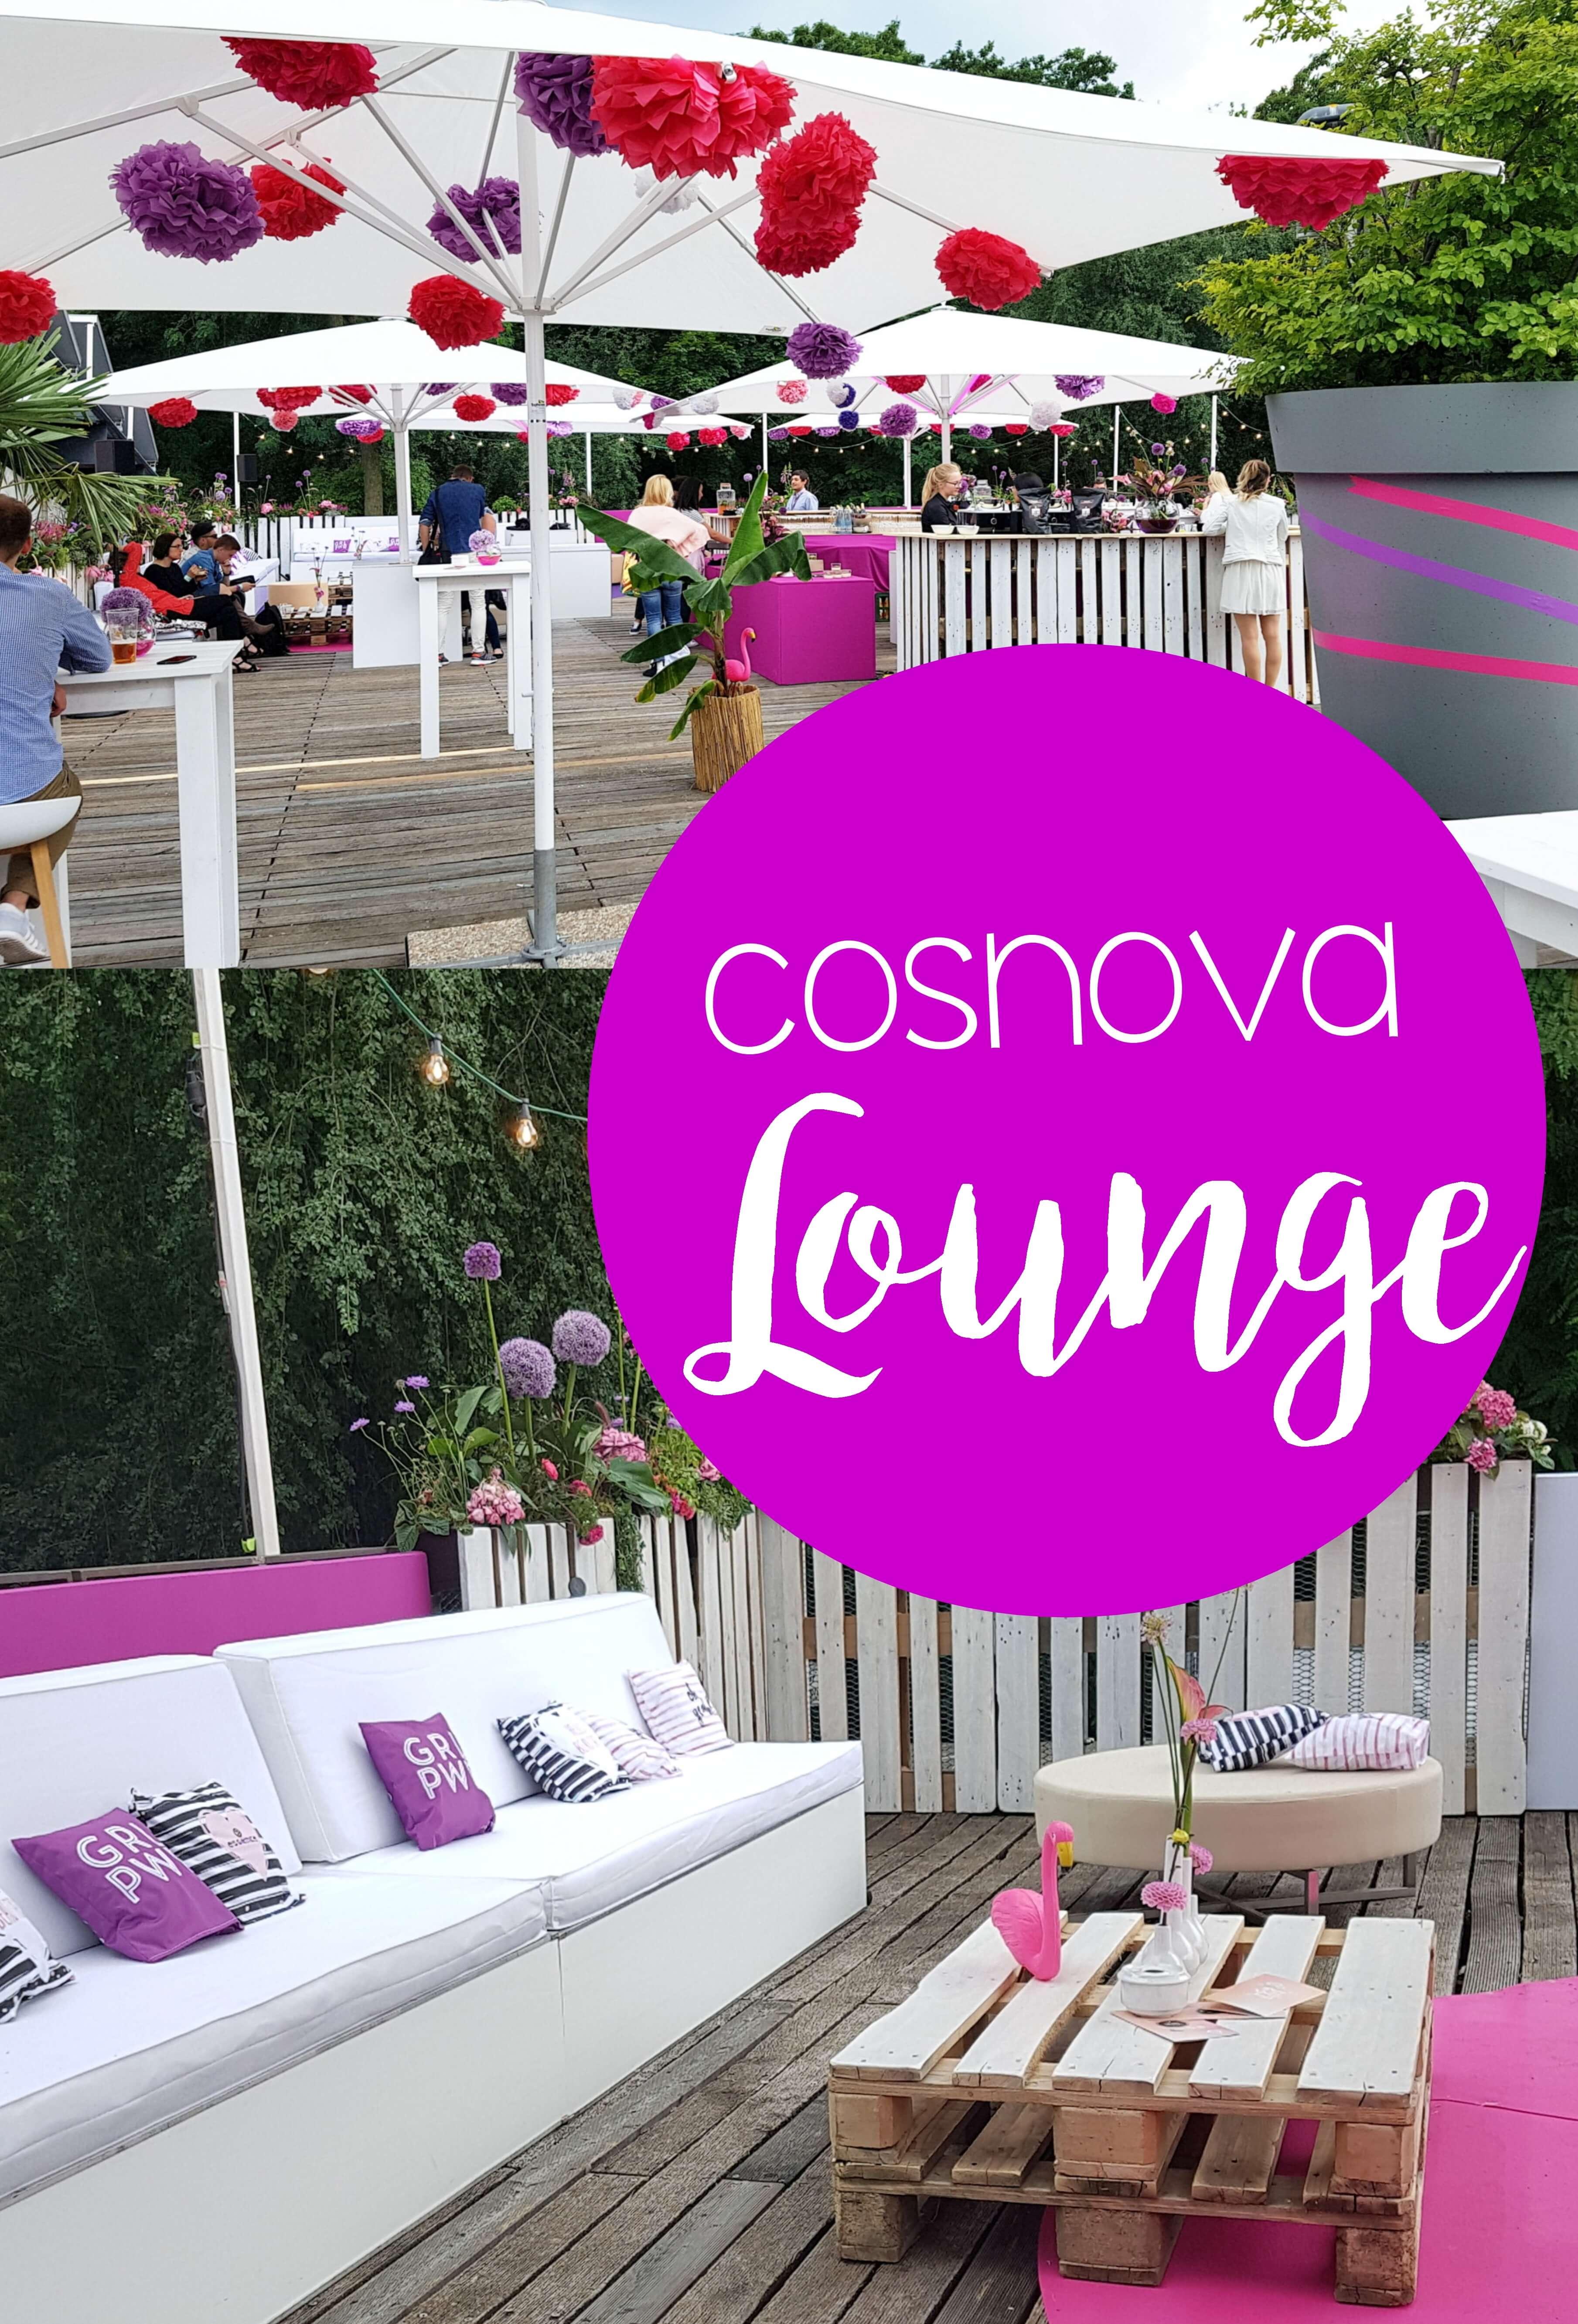 essence Birthday Bash Cosnova Lounge tantedine